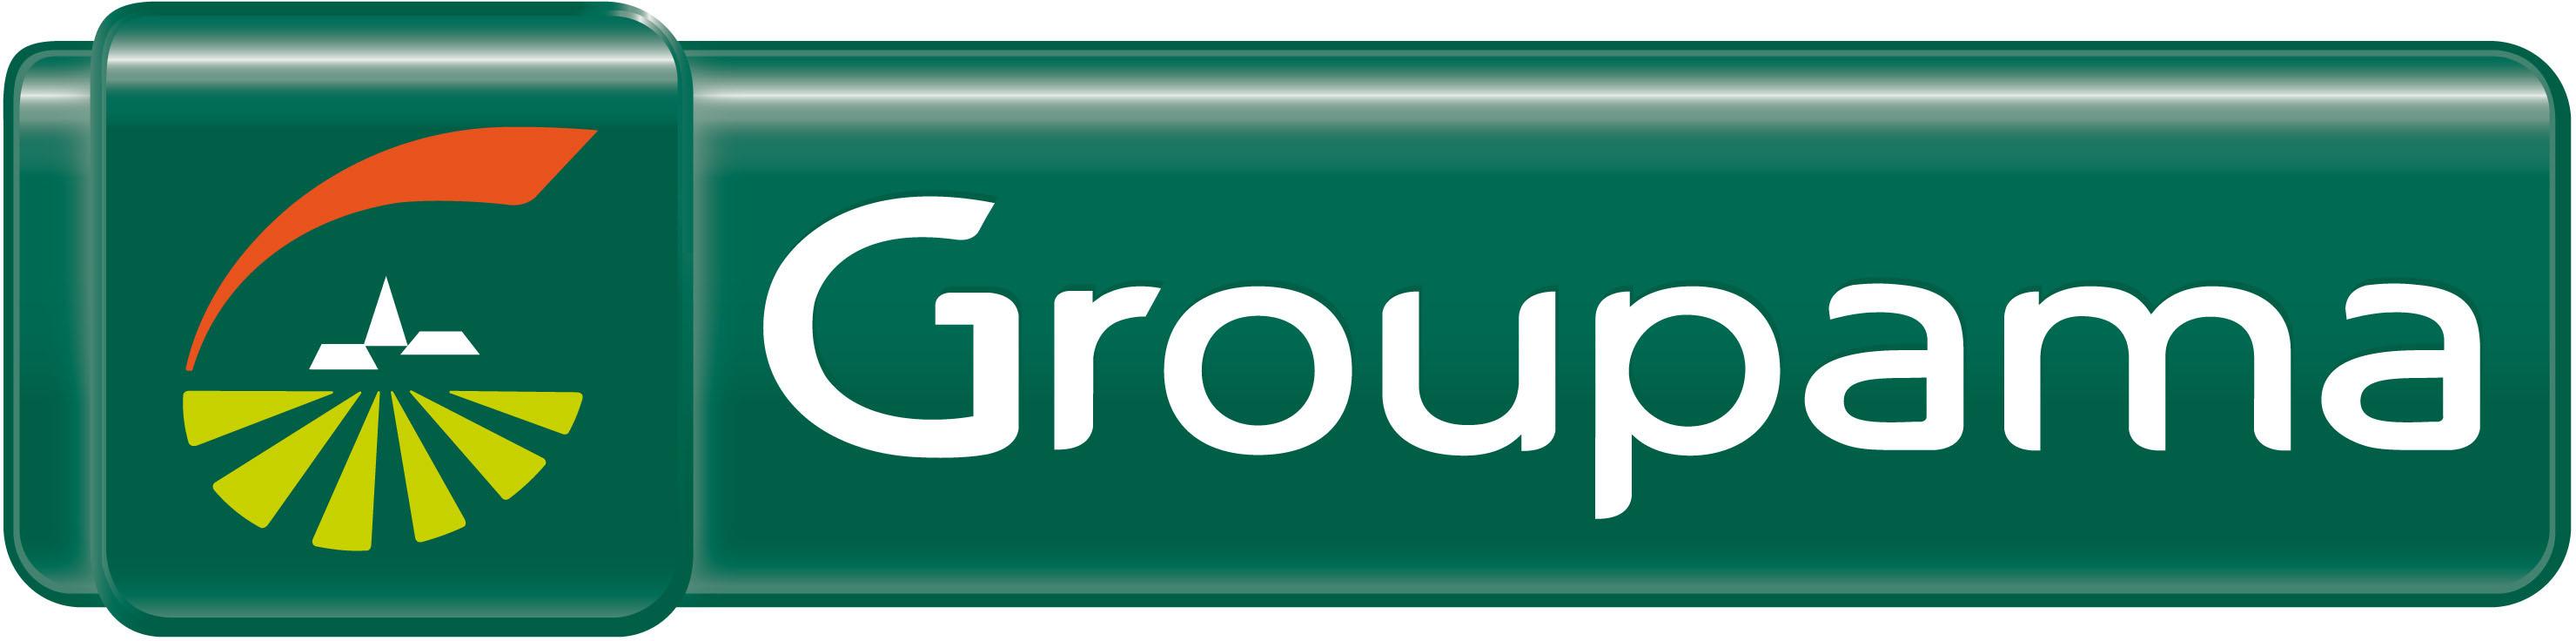 Groupama_Seul_logo_Q_50cm